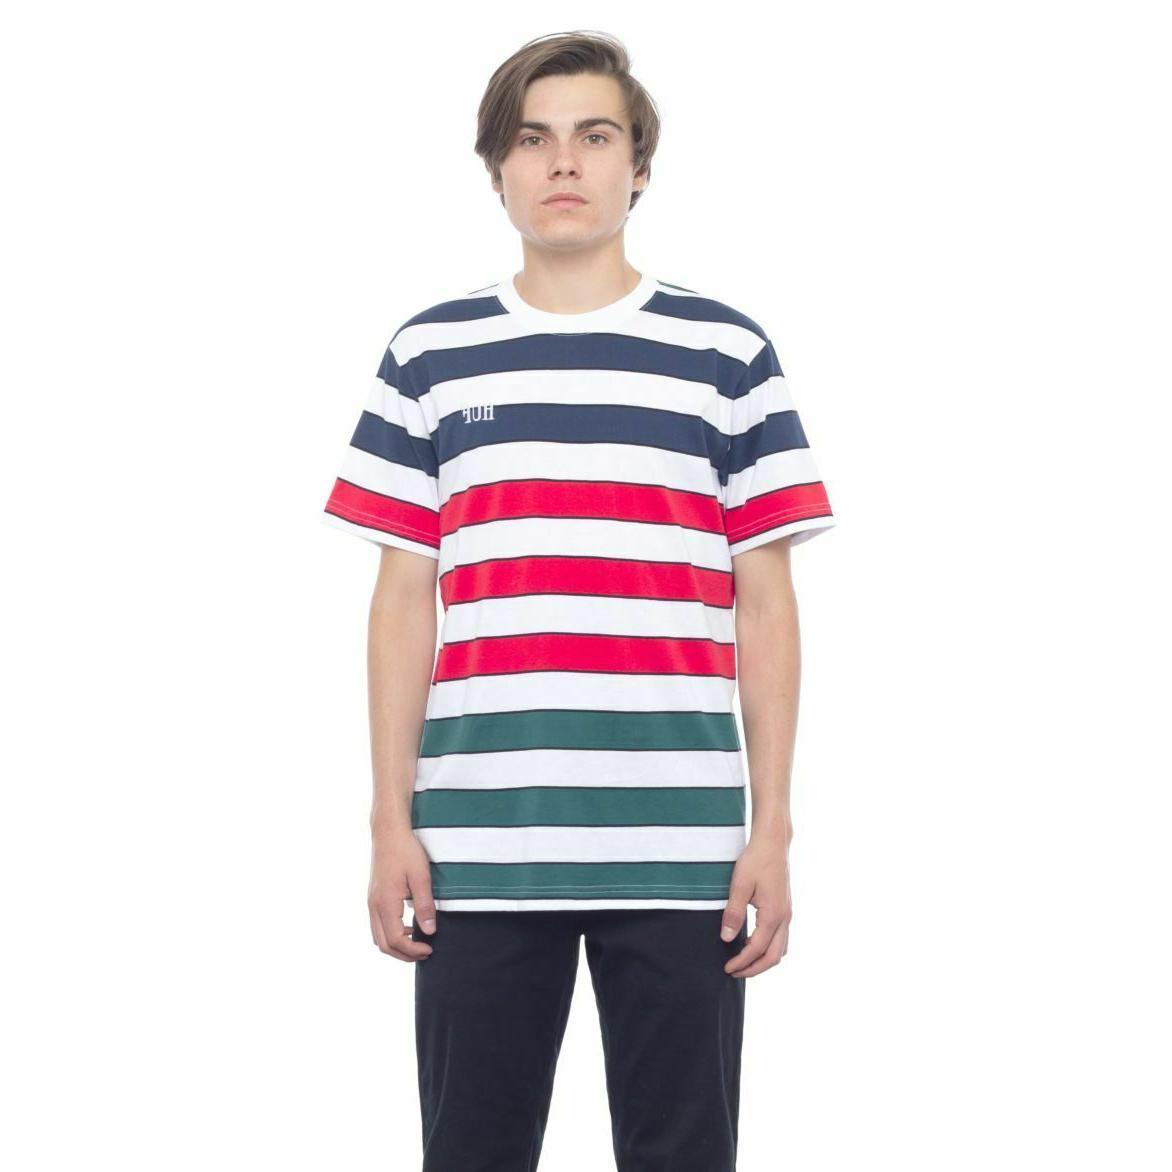 HUF Streetwear Mens Clothing KNIT TOP